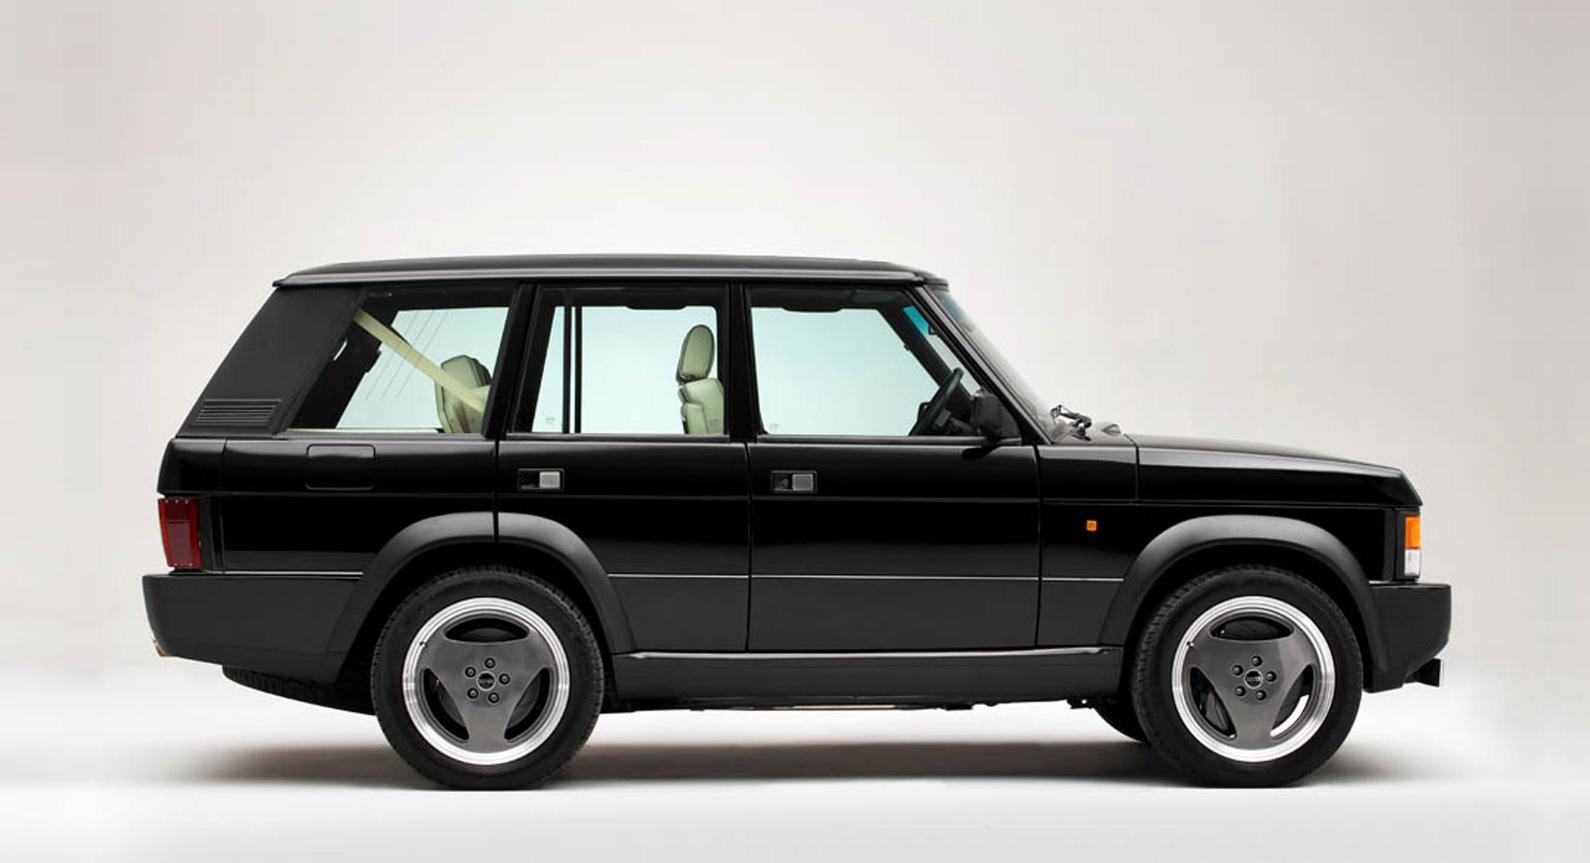 The Jensen International Automotive Range Rover Chieftain